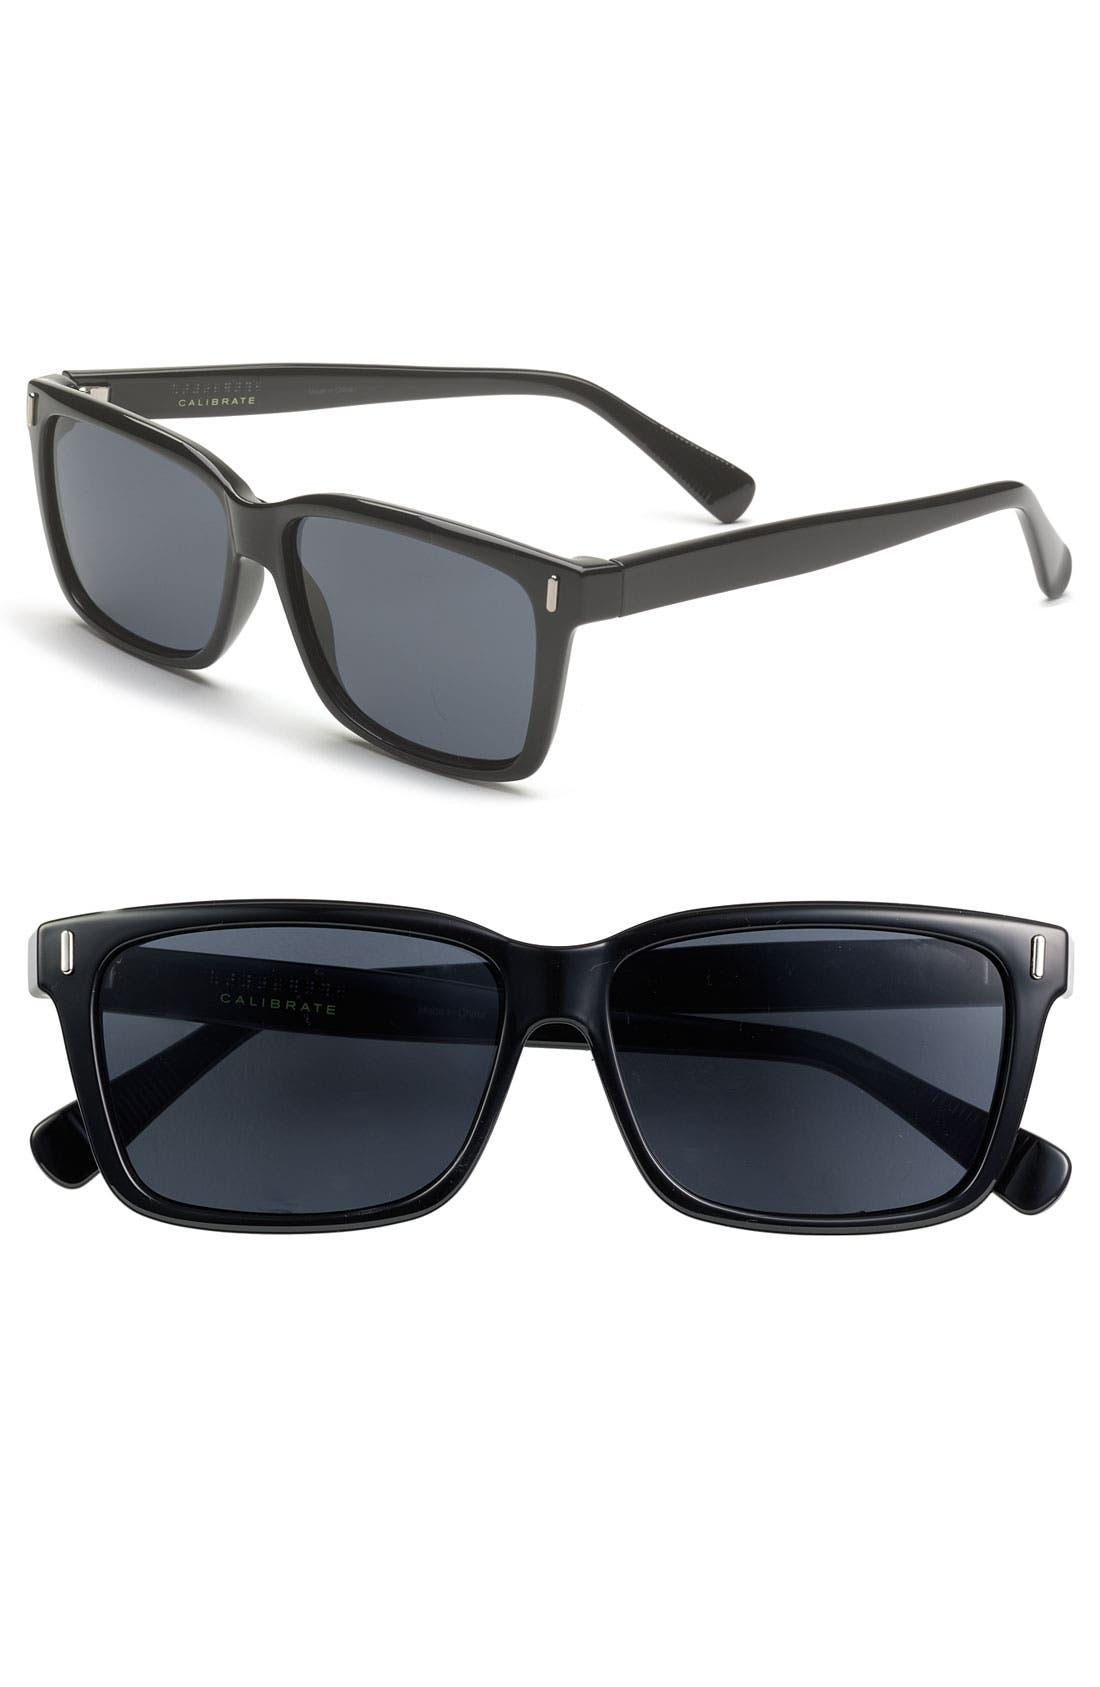 Main Image - Calibrate 'Josh' Sunglasses